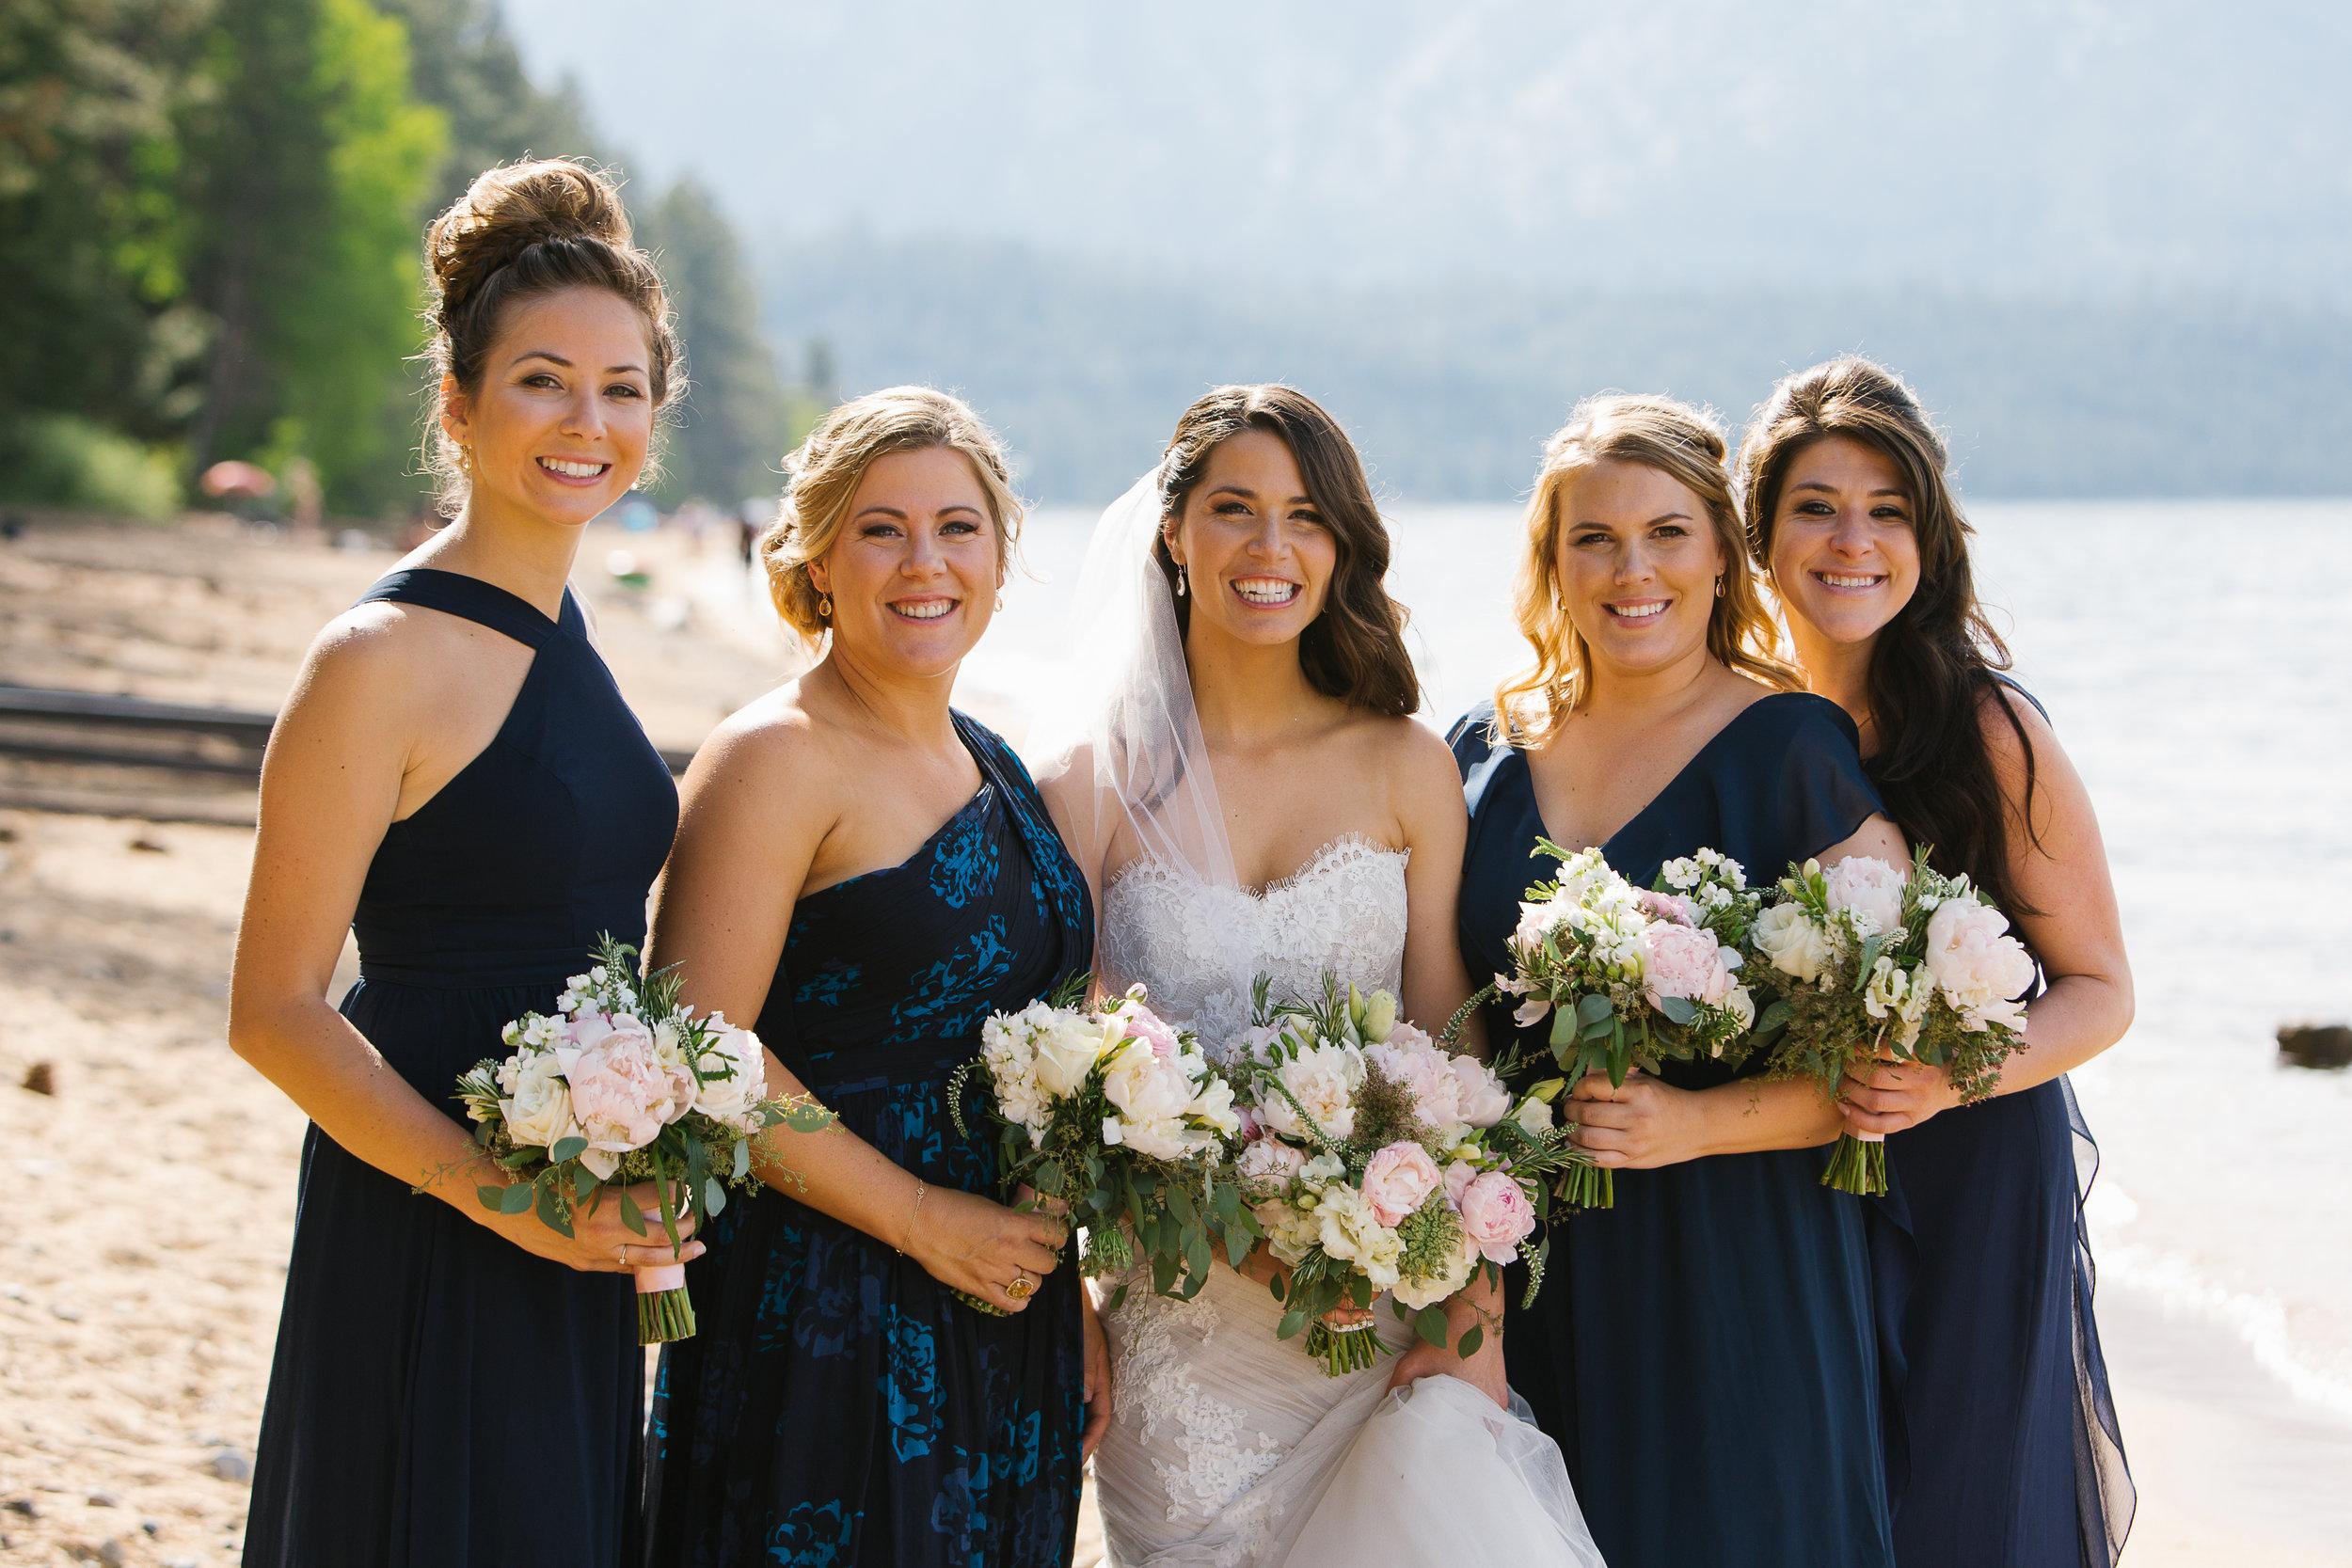 Ryan-Katie-Wedding-449.jpg